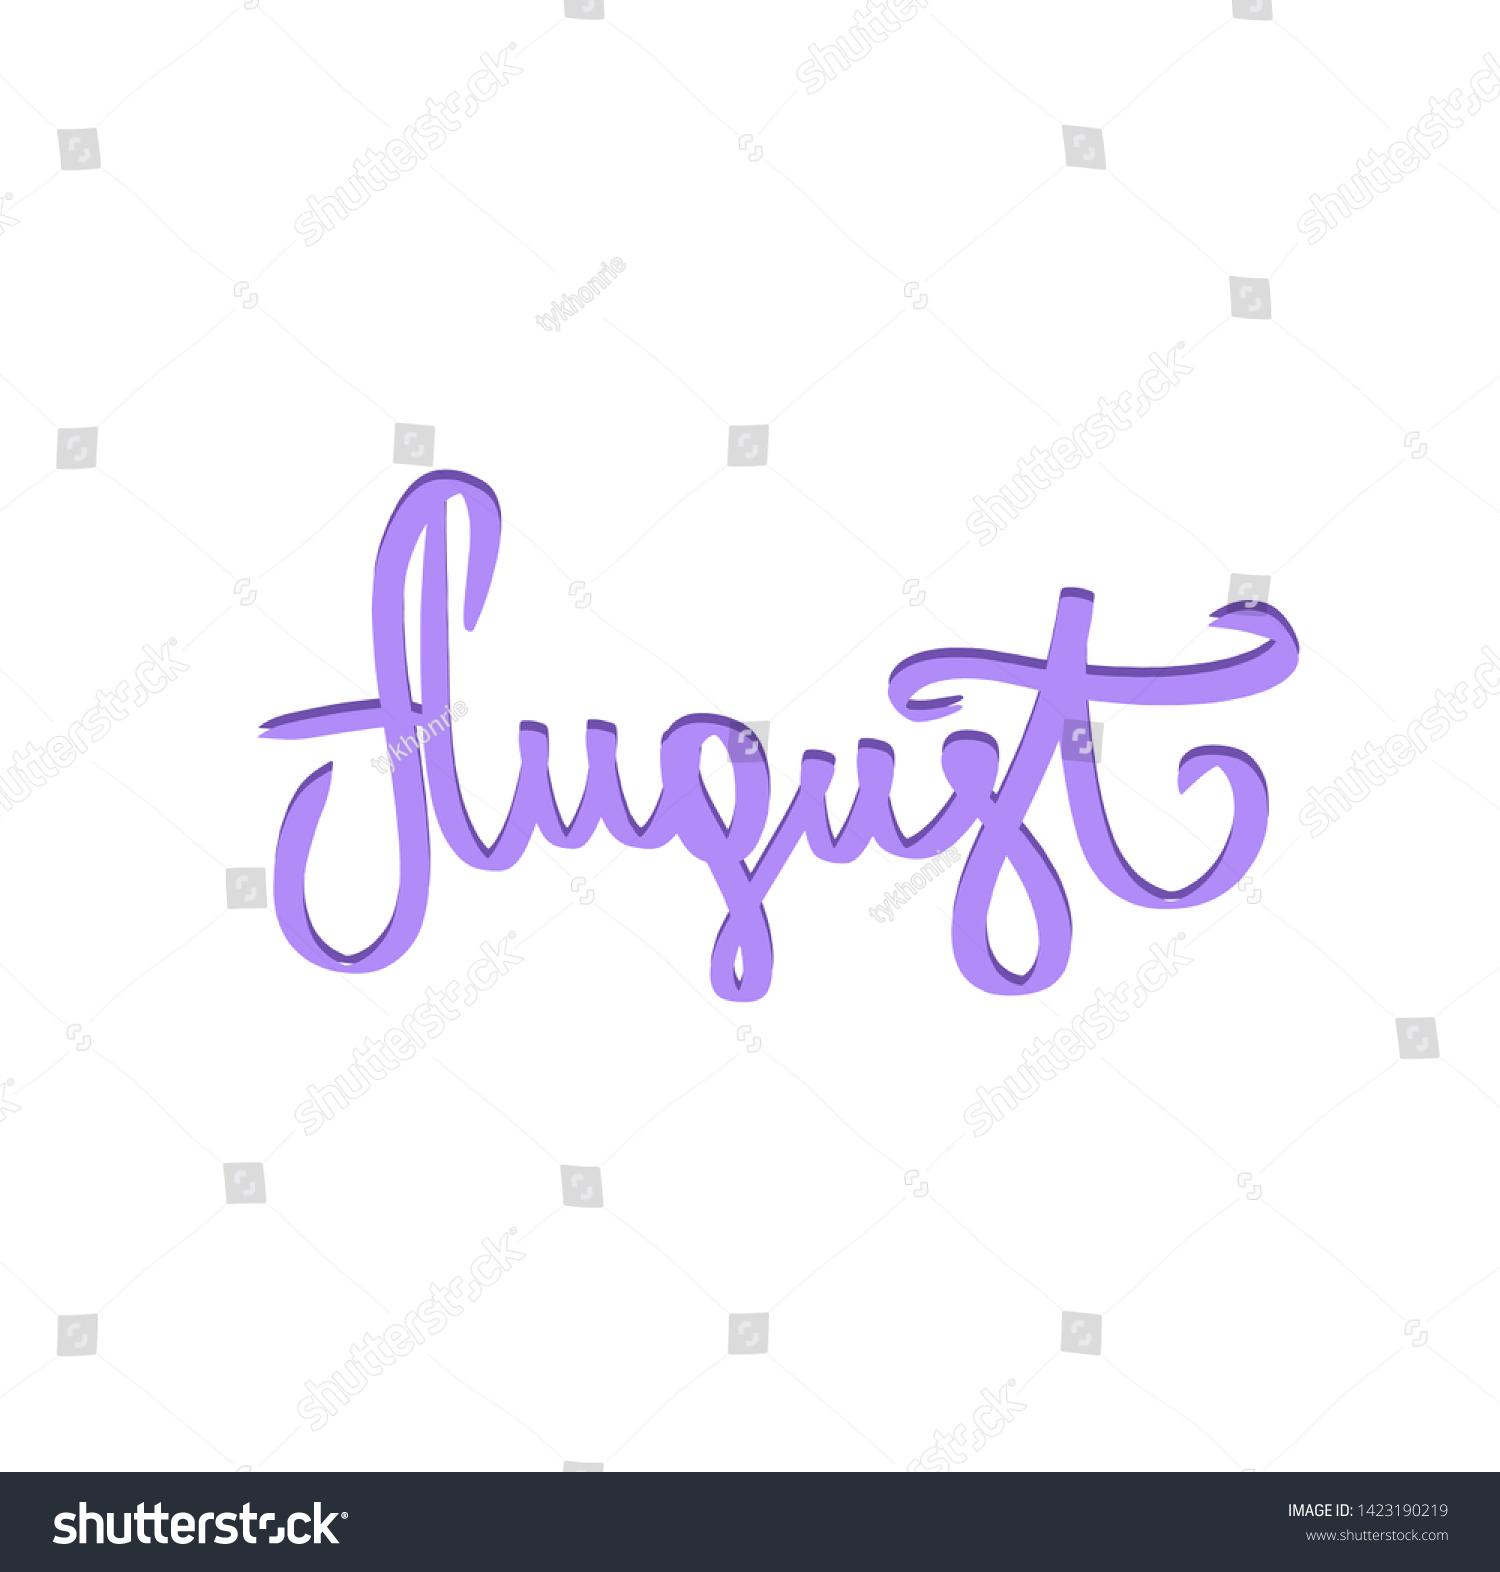 stock-vector-violet-august-handwritten-n